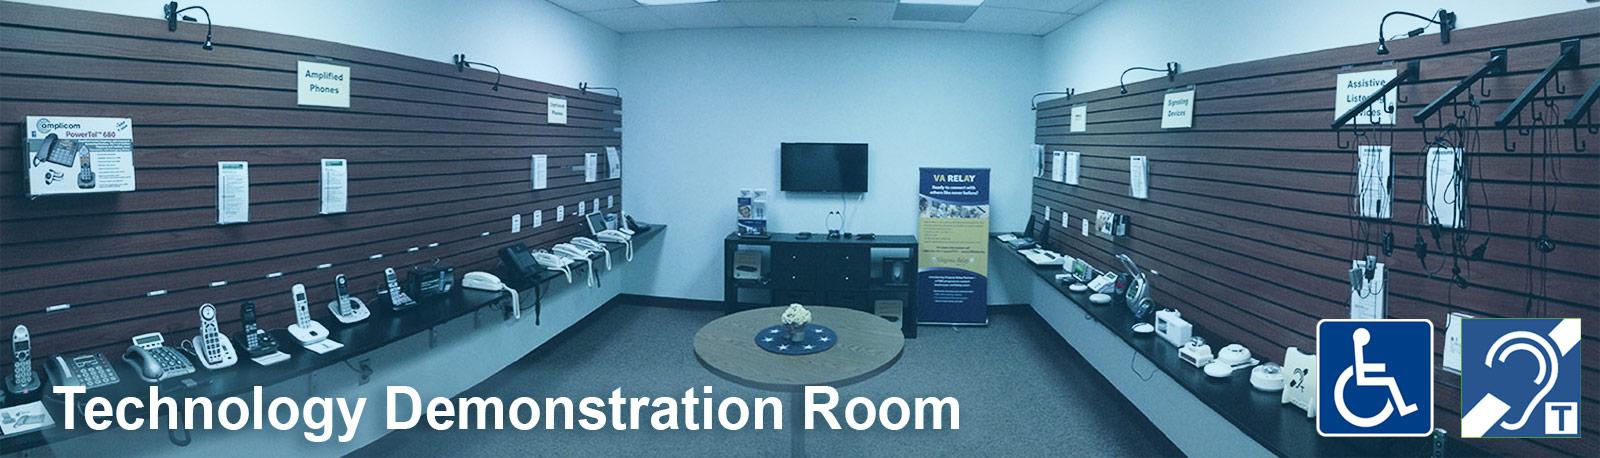 Technology Demonstration Room